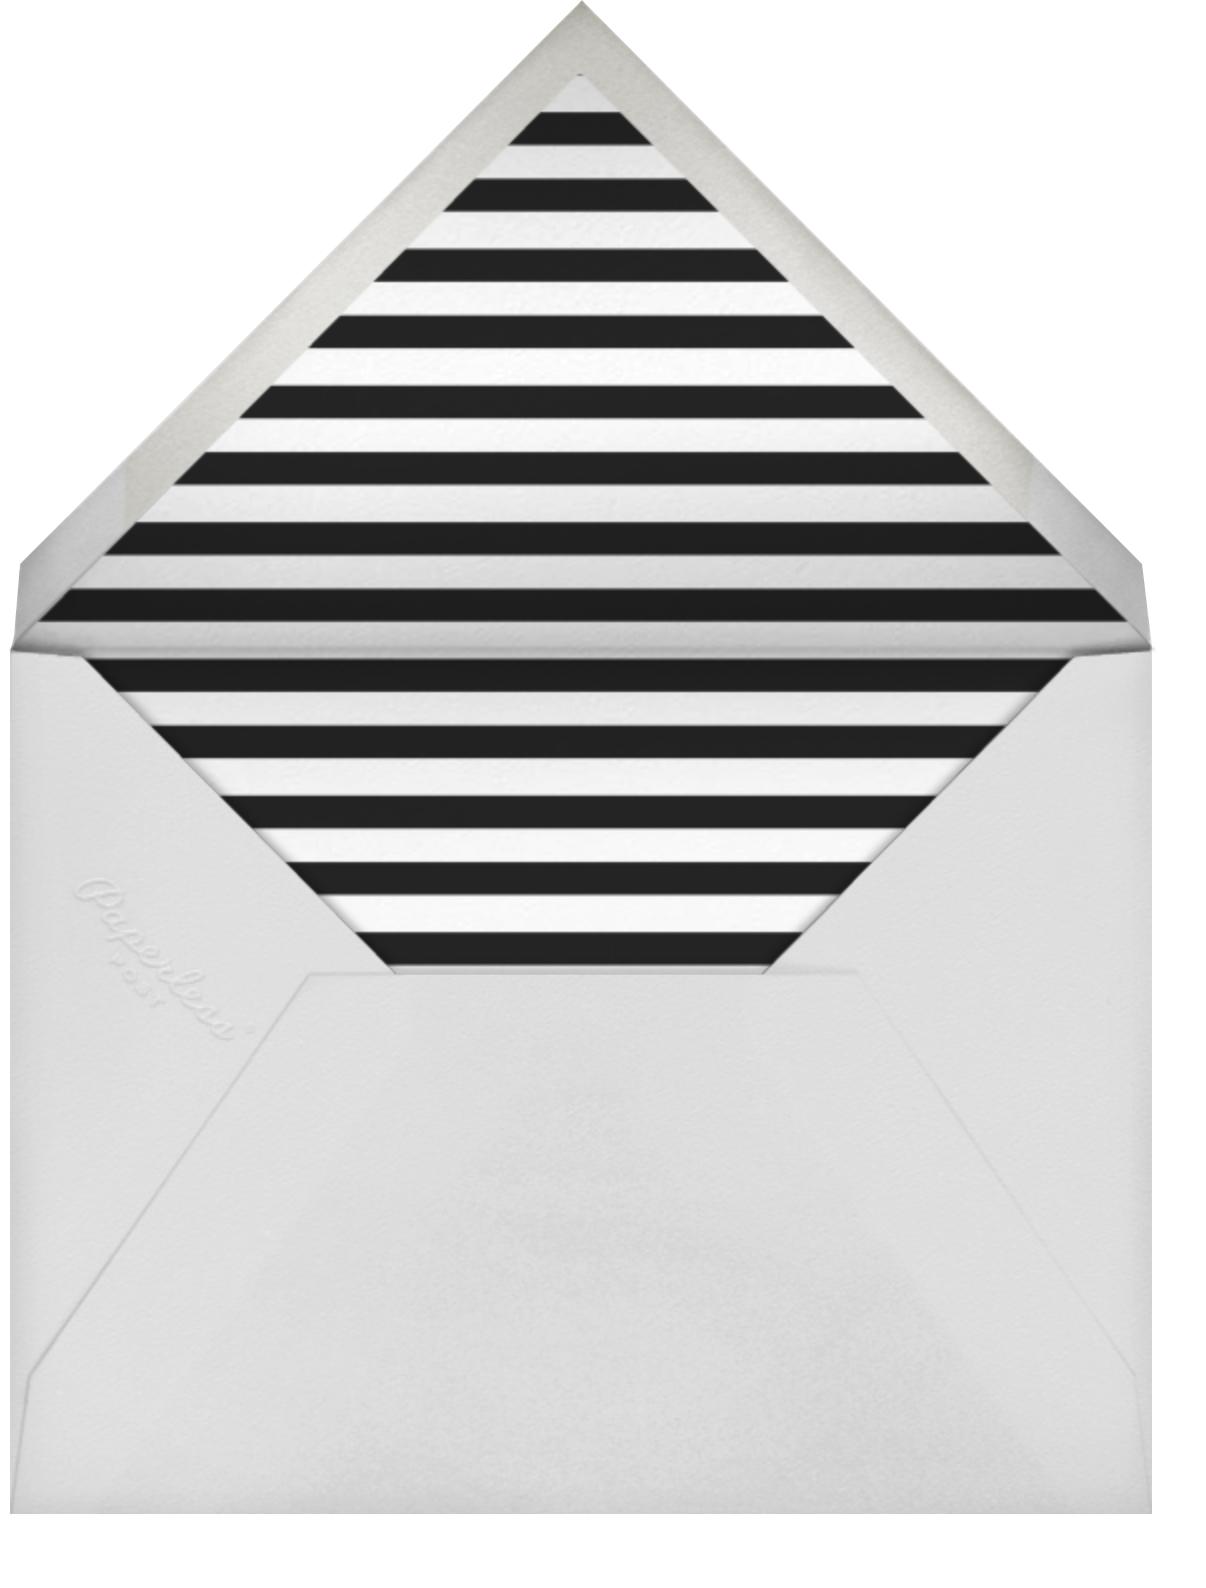 Horizontal Photo on Tall - Paperless Post - Eventbrite - envelope back